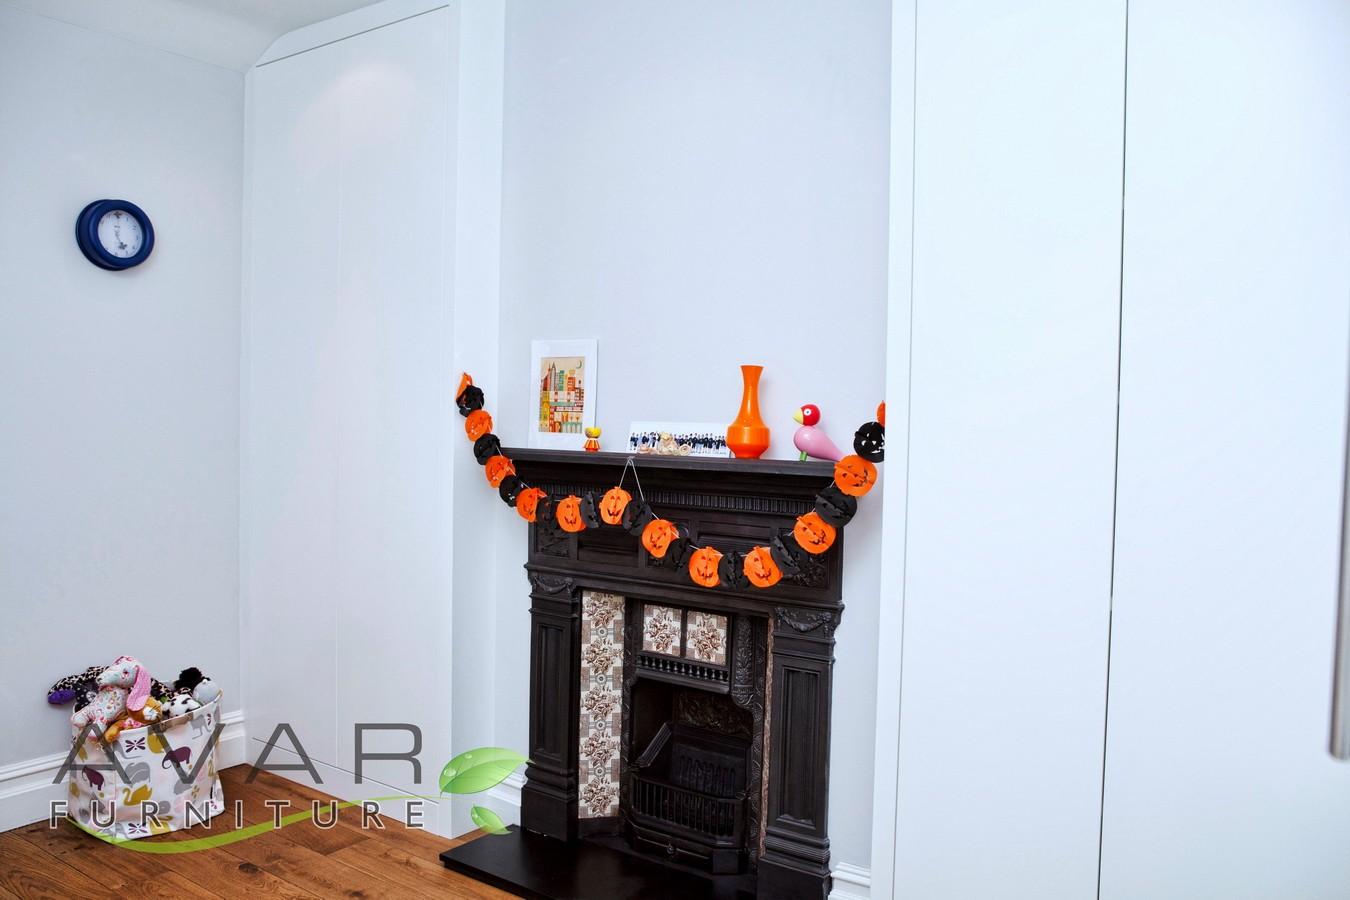 Fitted wardrobe ideas gallery 3 north london uk avar furniture - Fitted Wardrobe Ideas Gallery 5 North London Uk